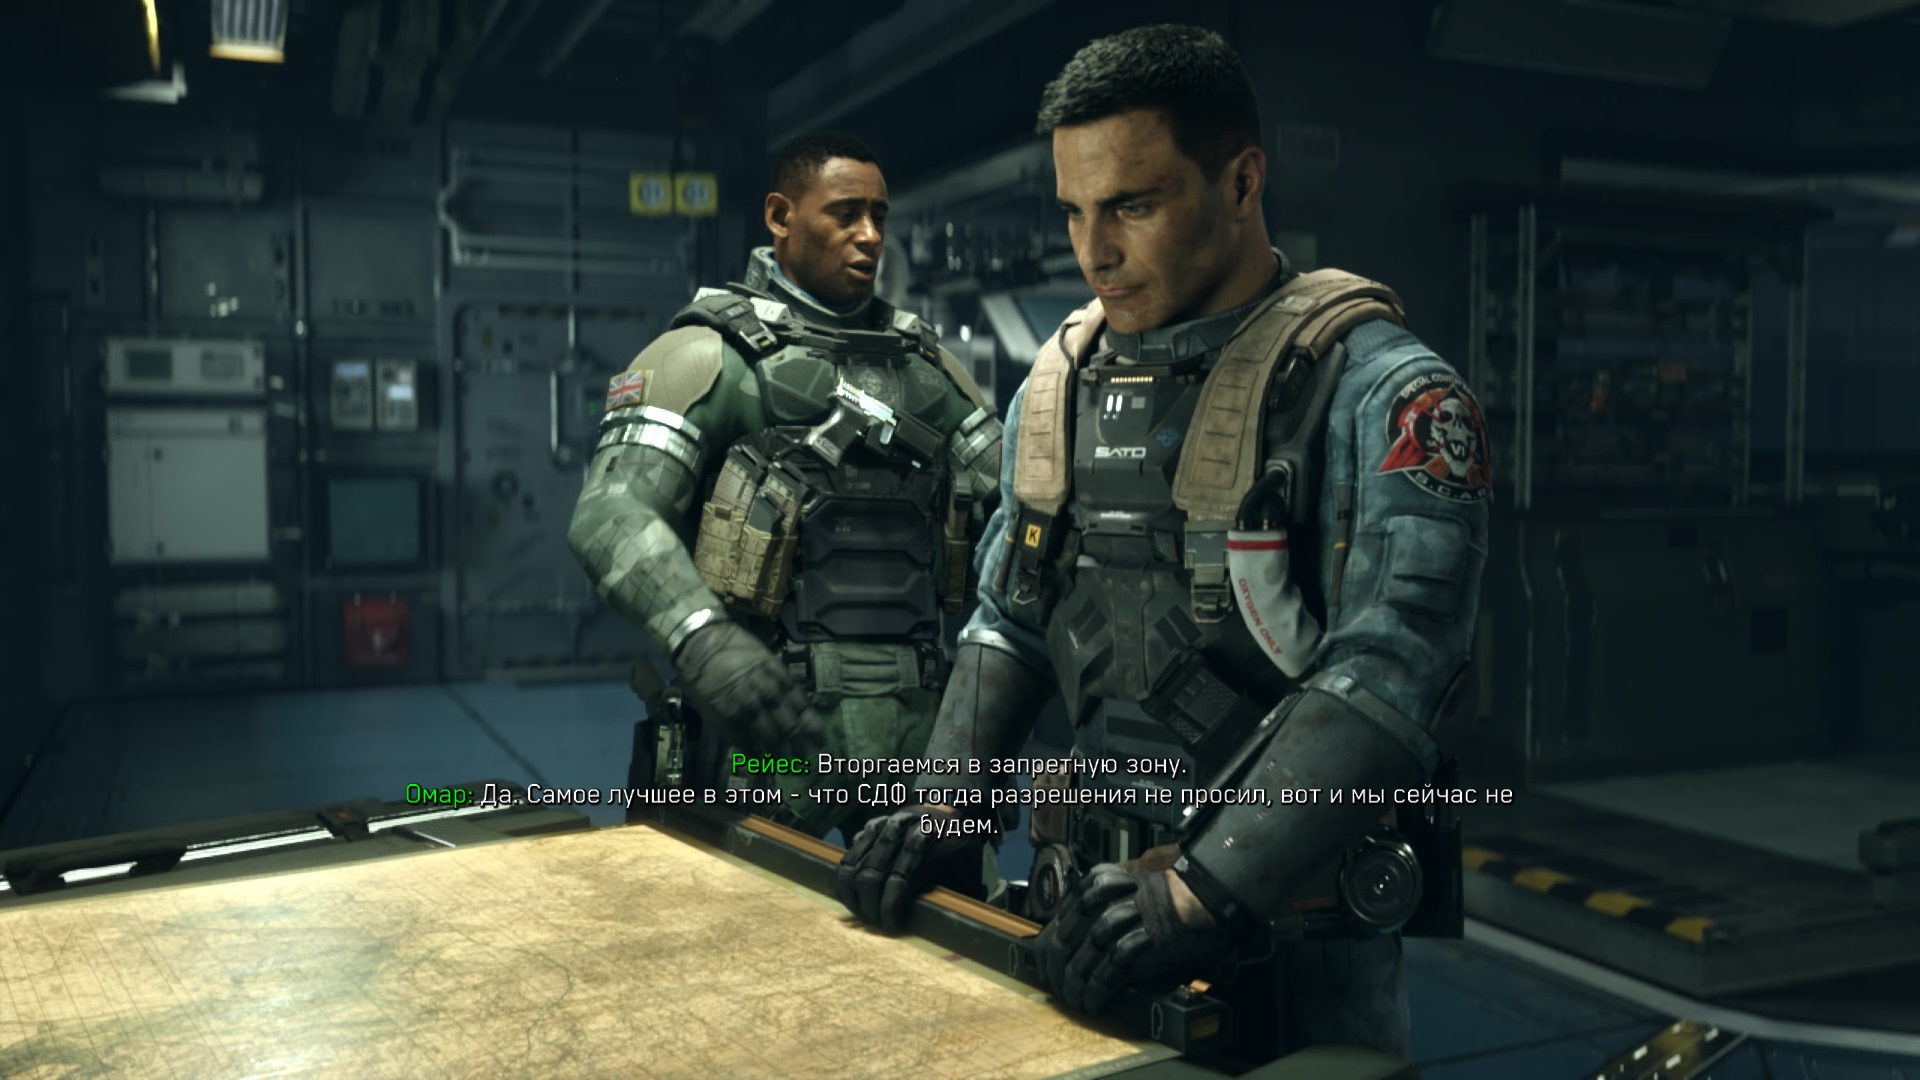 00070.Jpg - Call of Duty: Infinite Warfare